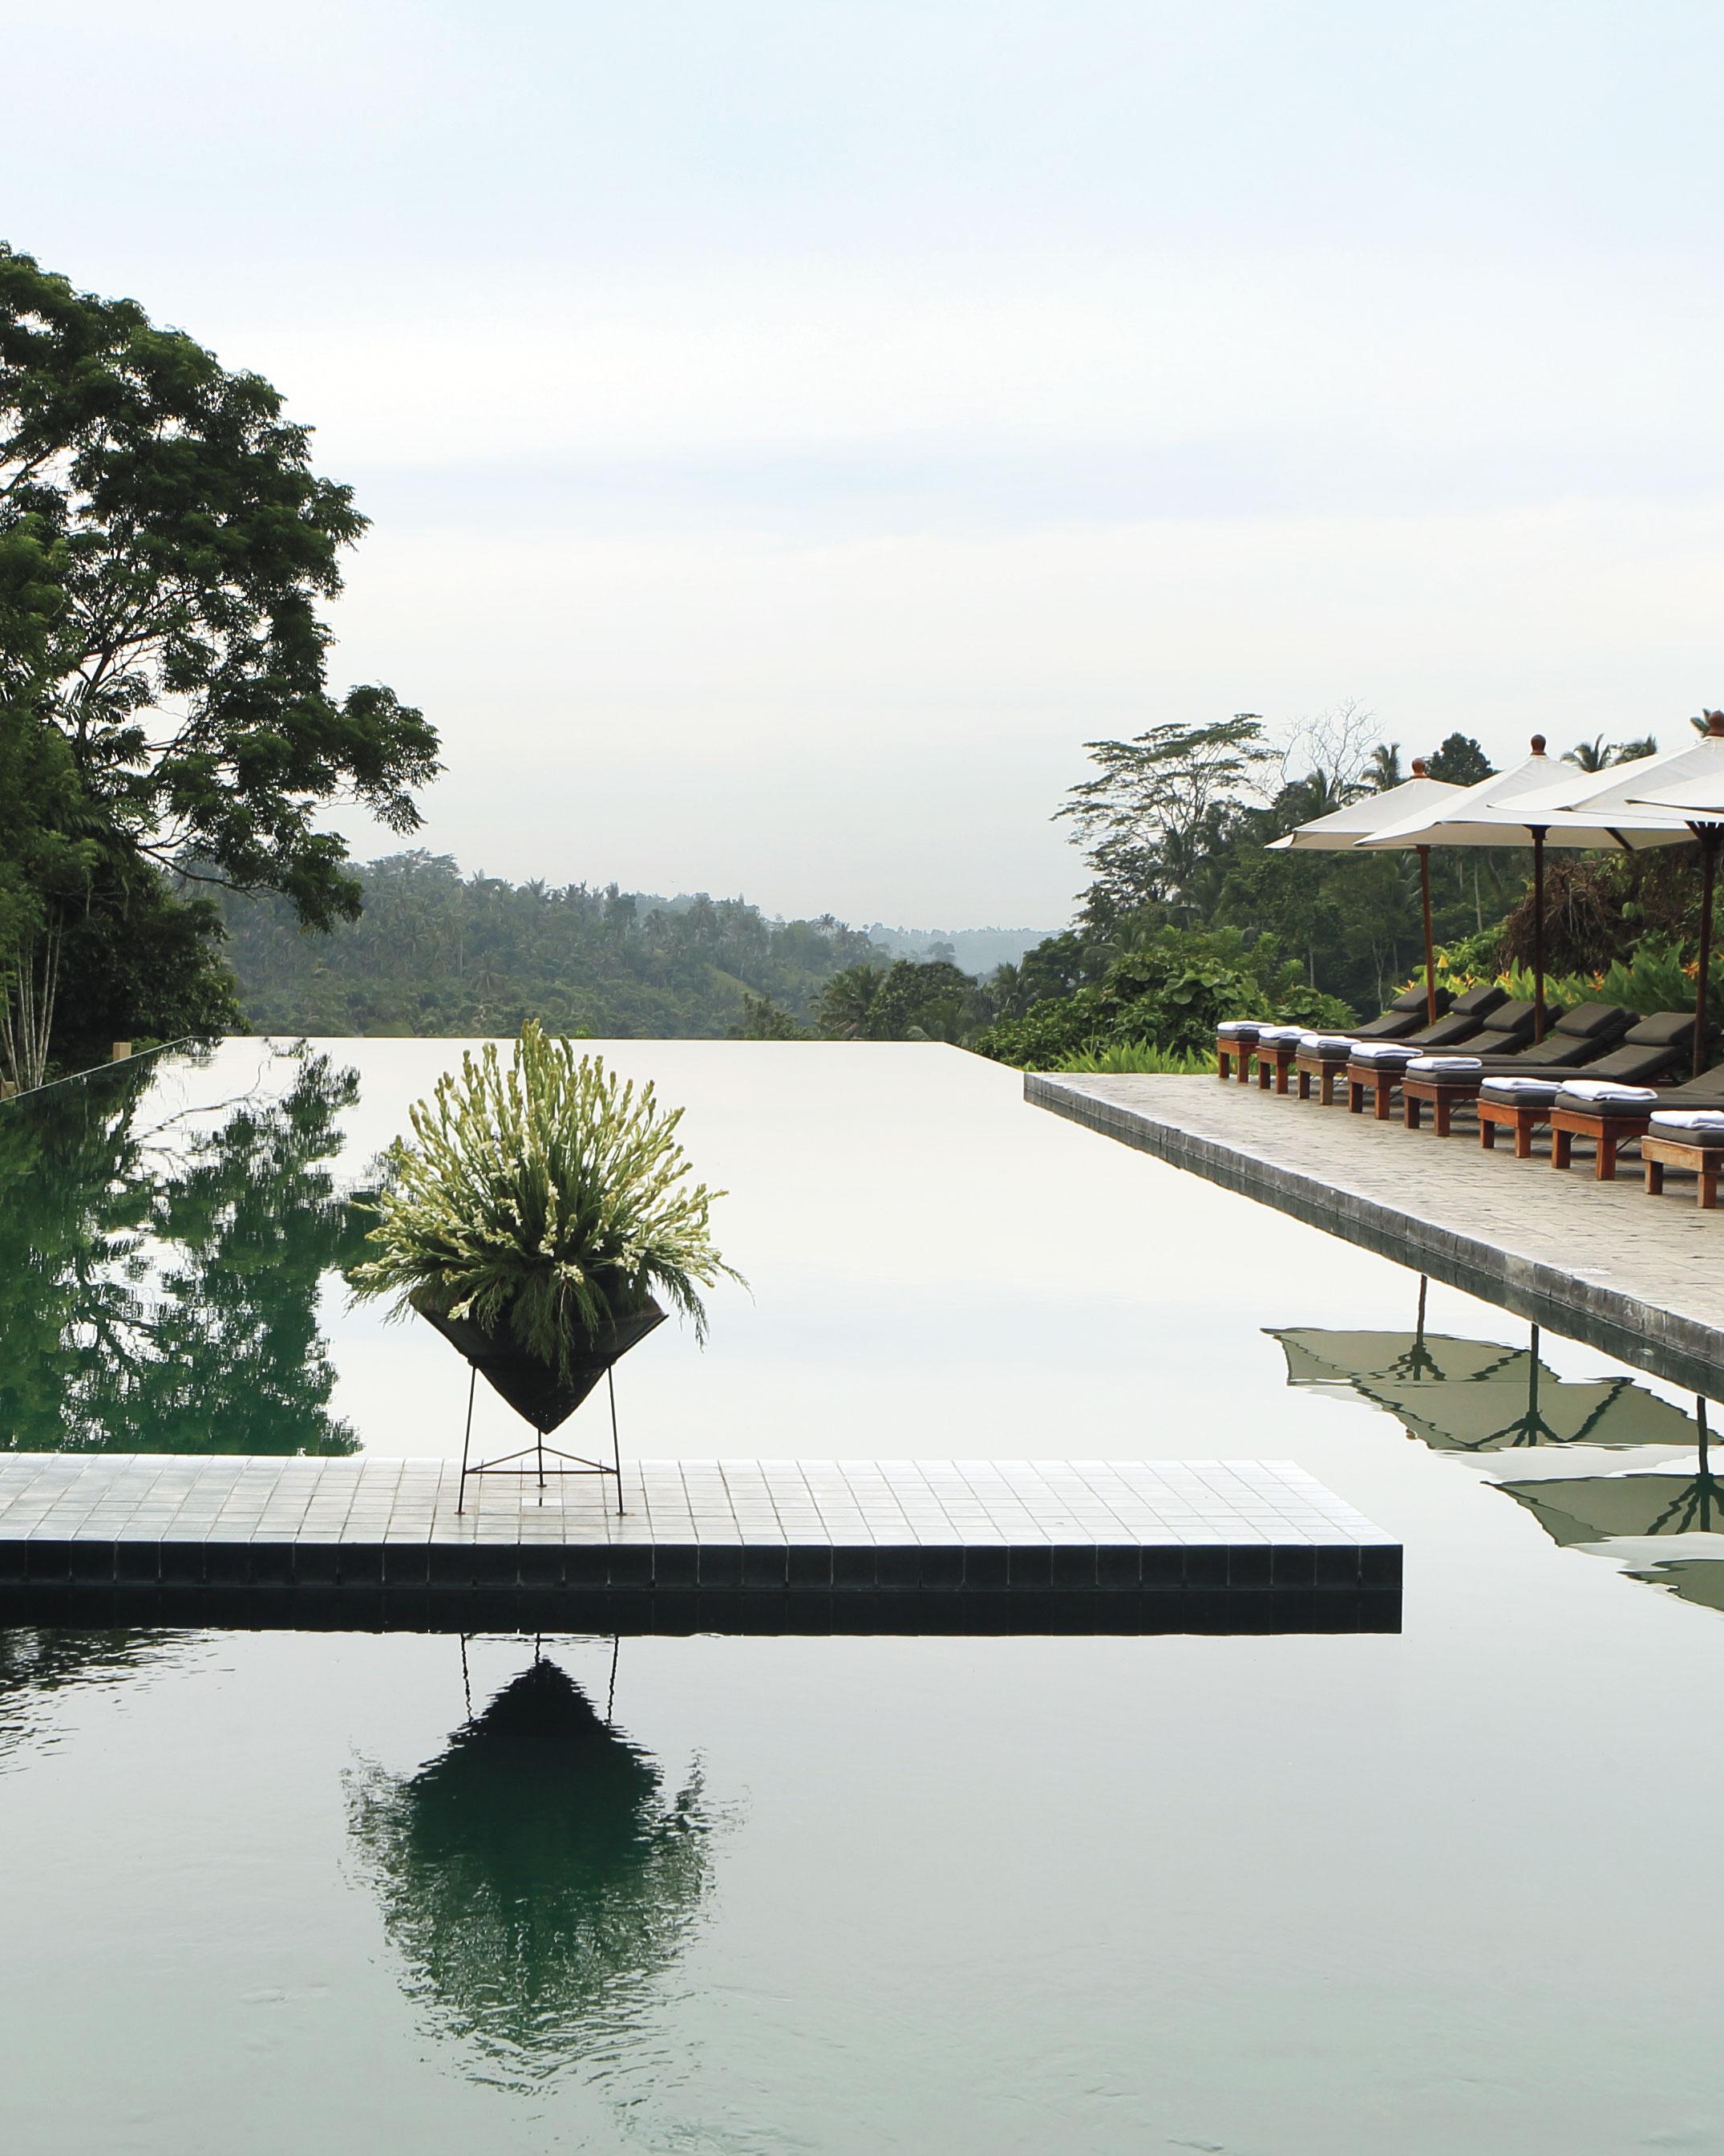 travel-alilaubud-pool-2-mwds110763.jpg